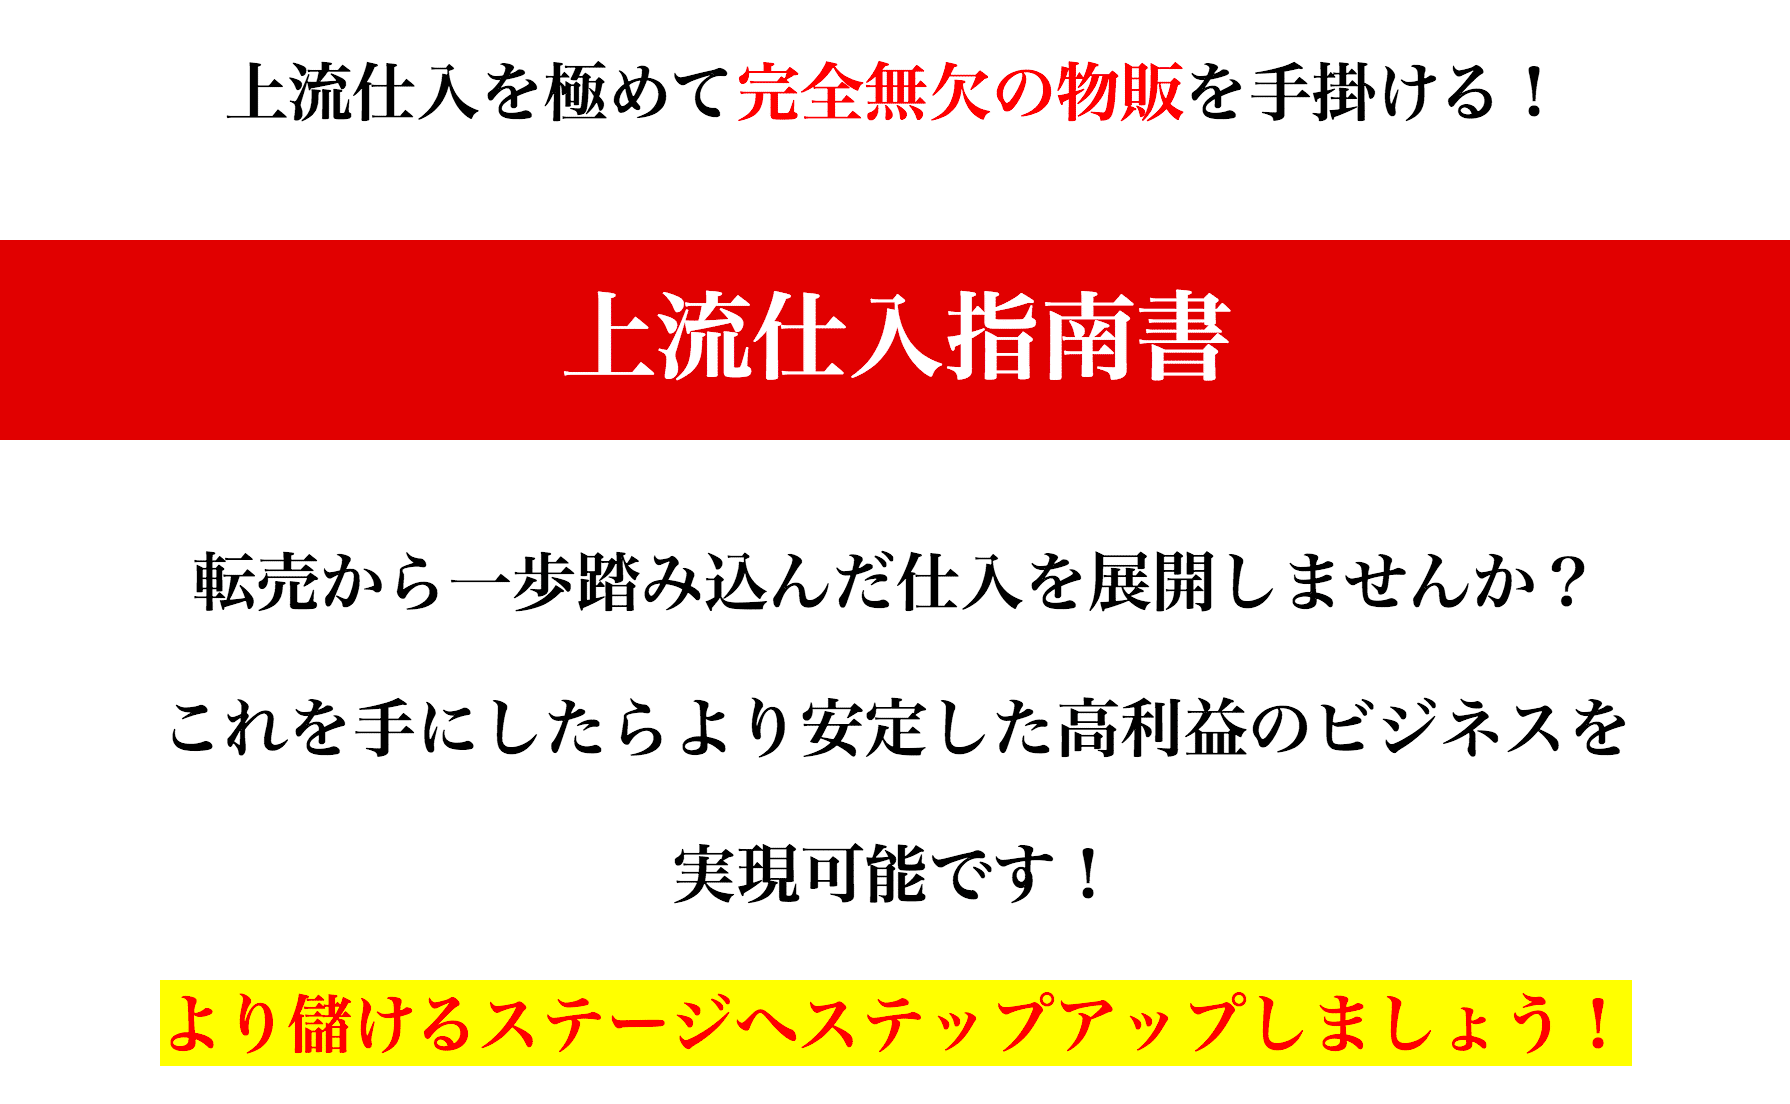 土山敬士朗の上流仕入指南書豪華特典付き評価レビュー